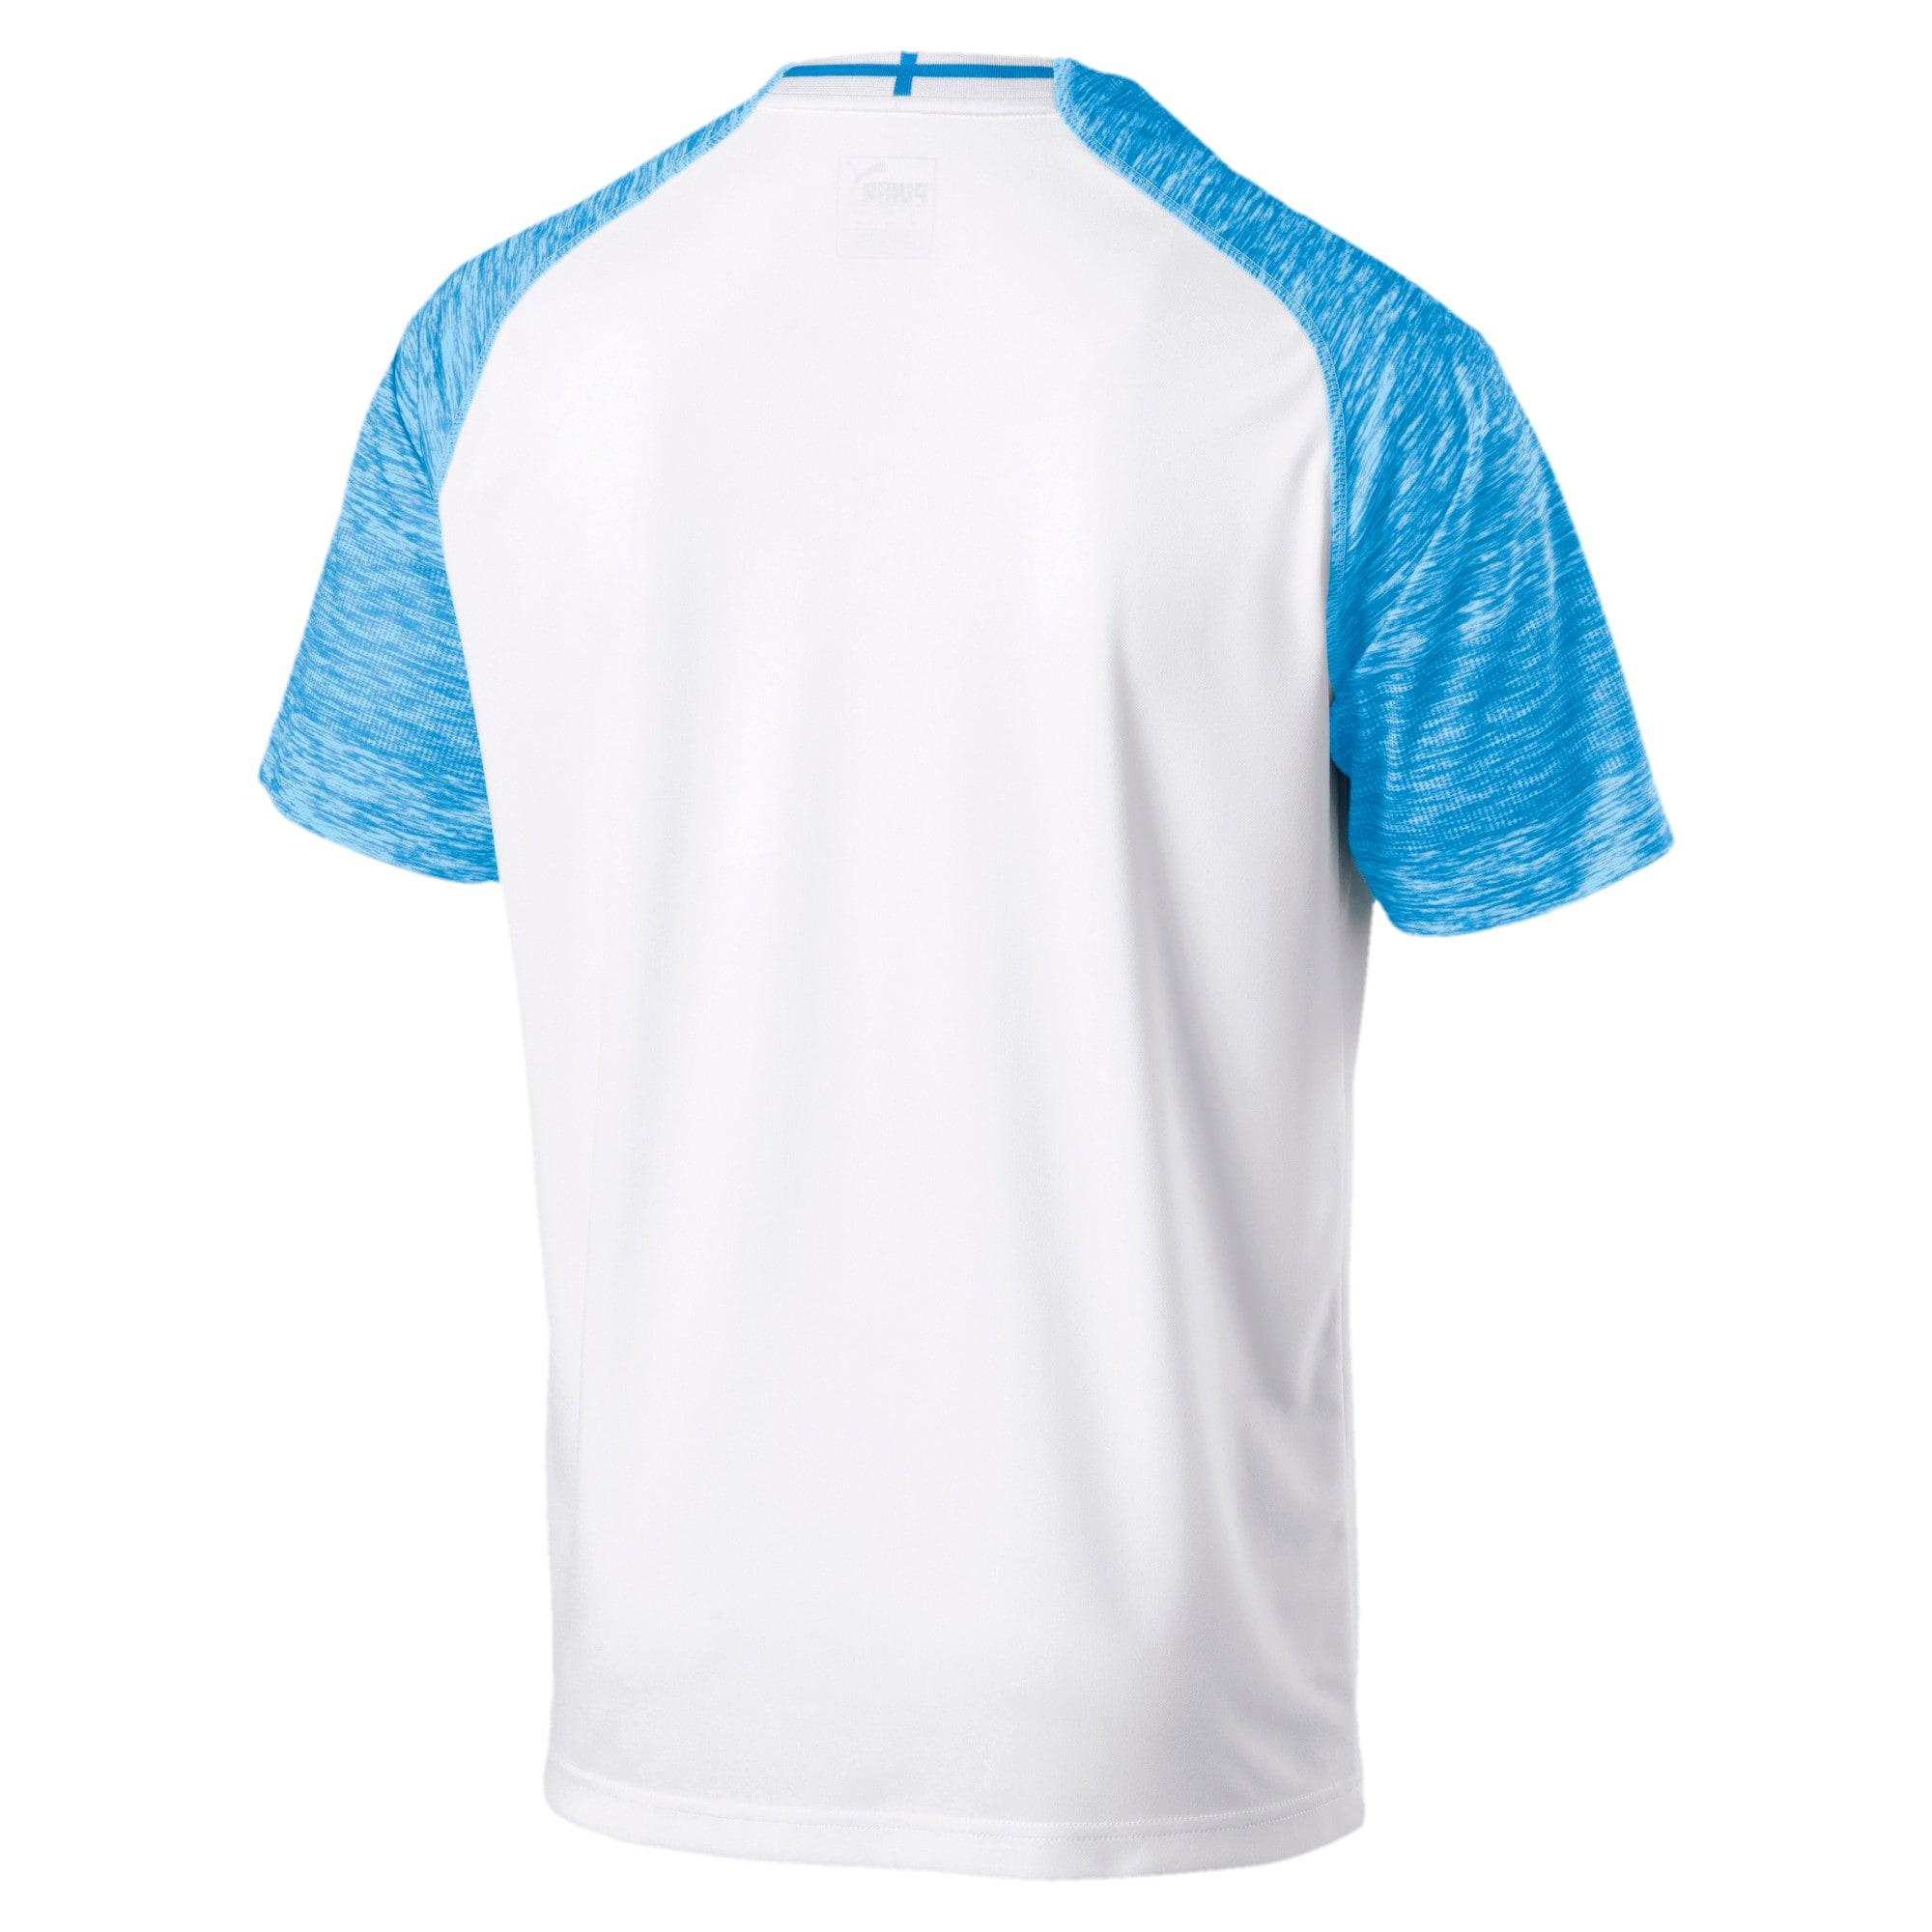 Miniatura 2 de Réplica de la camiseta de local delOlympique de Marseillepara hombre, Puma White-Bleu Azur, mediano